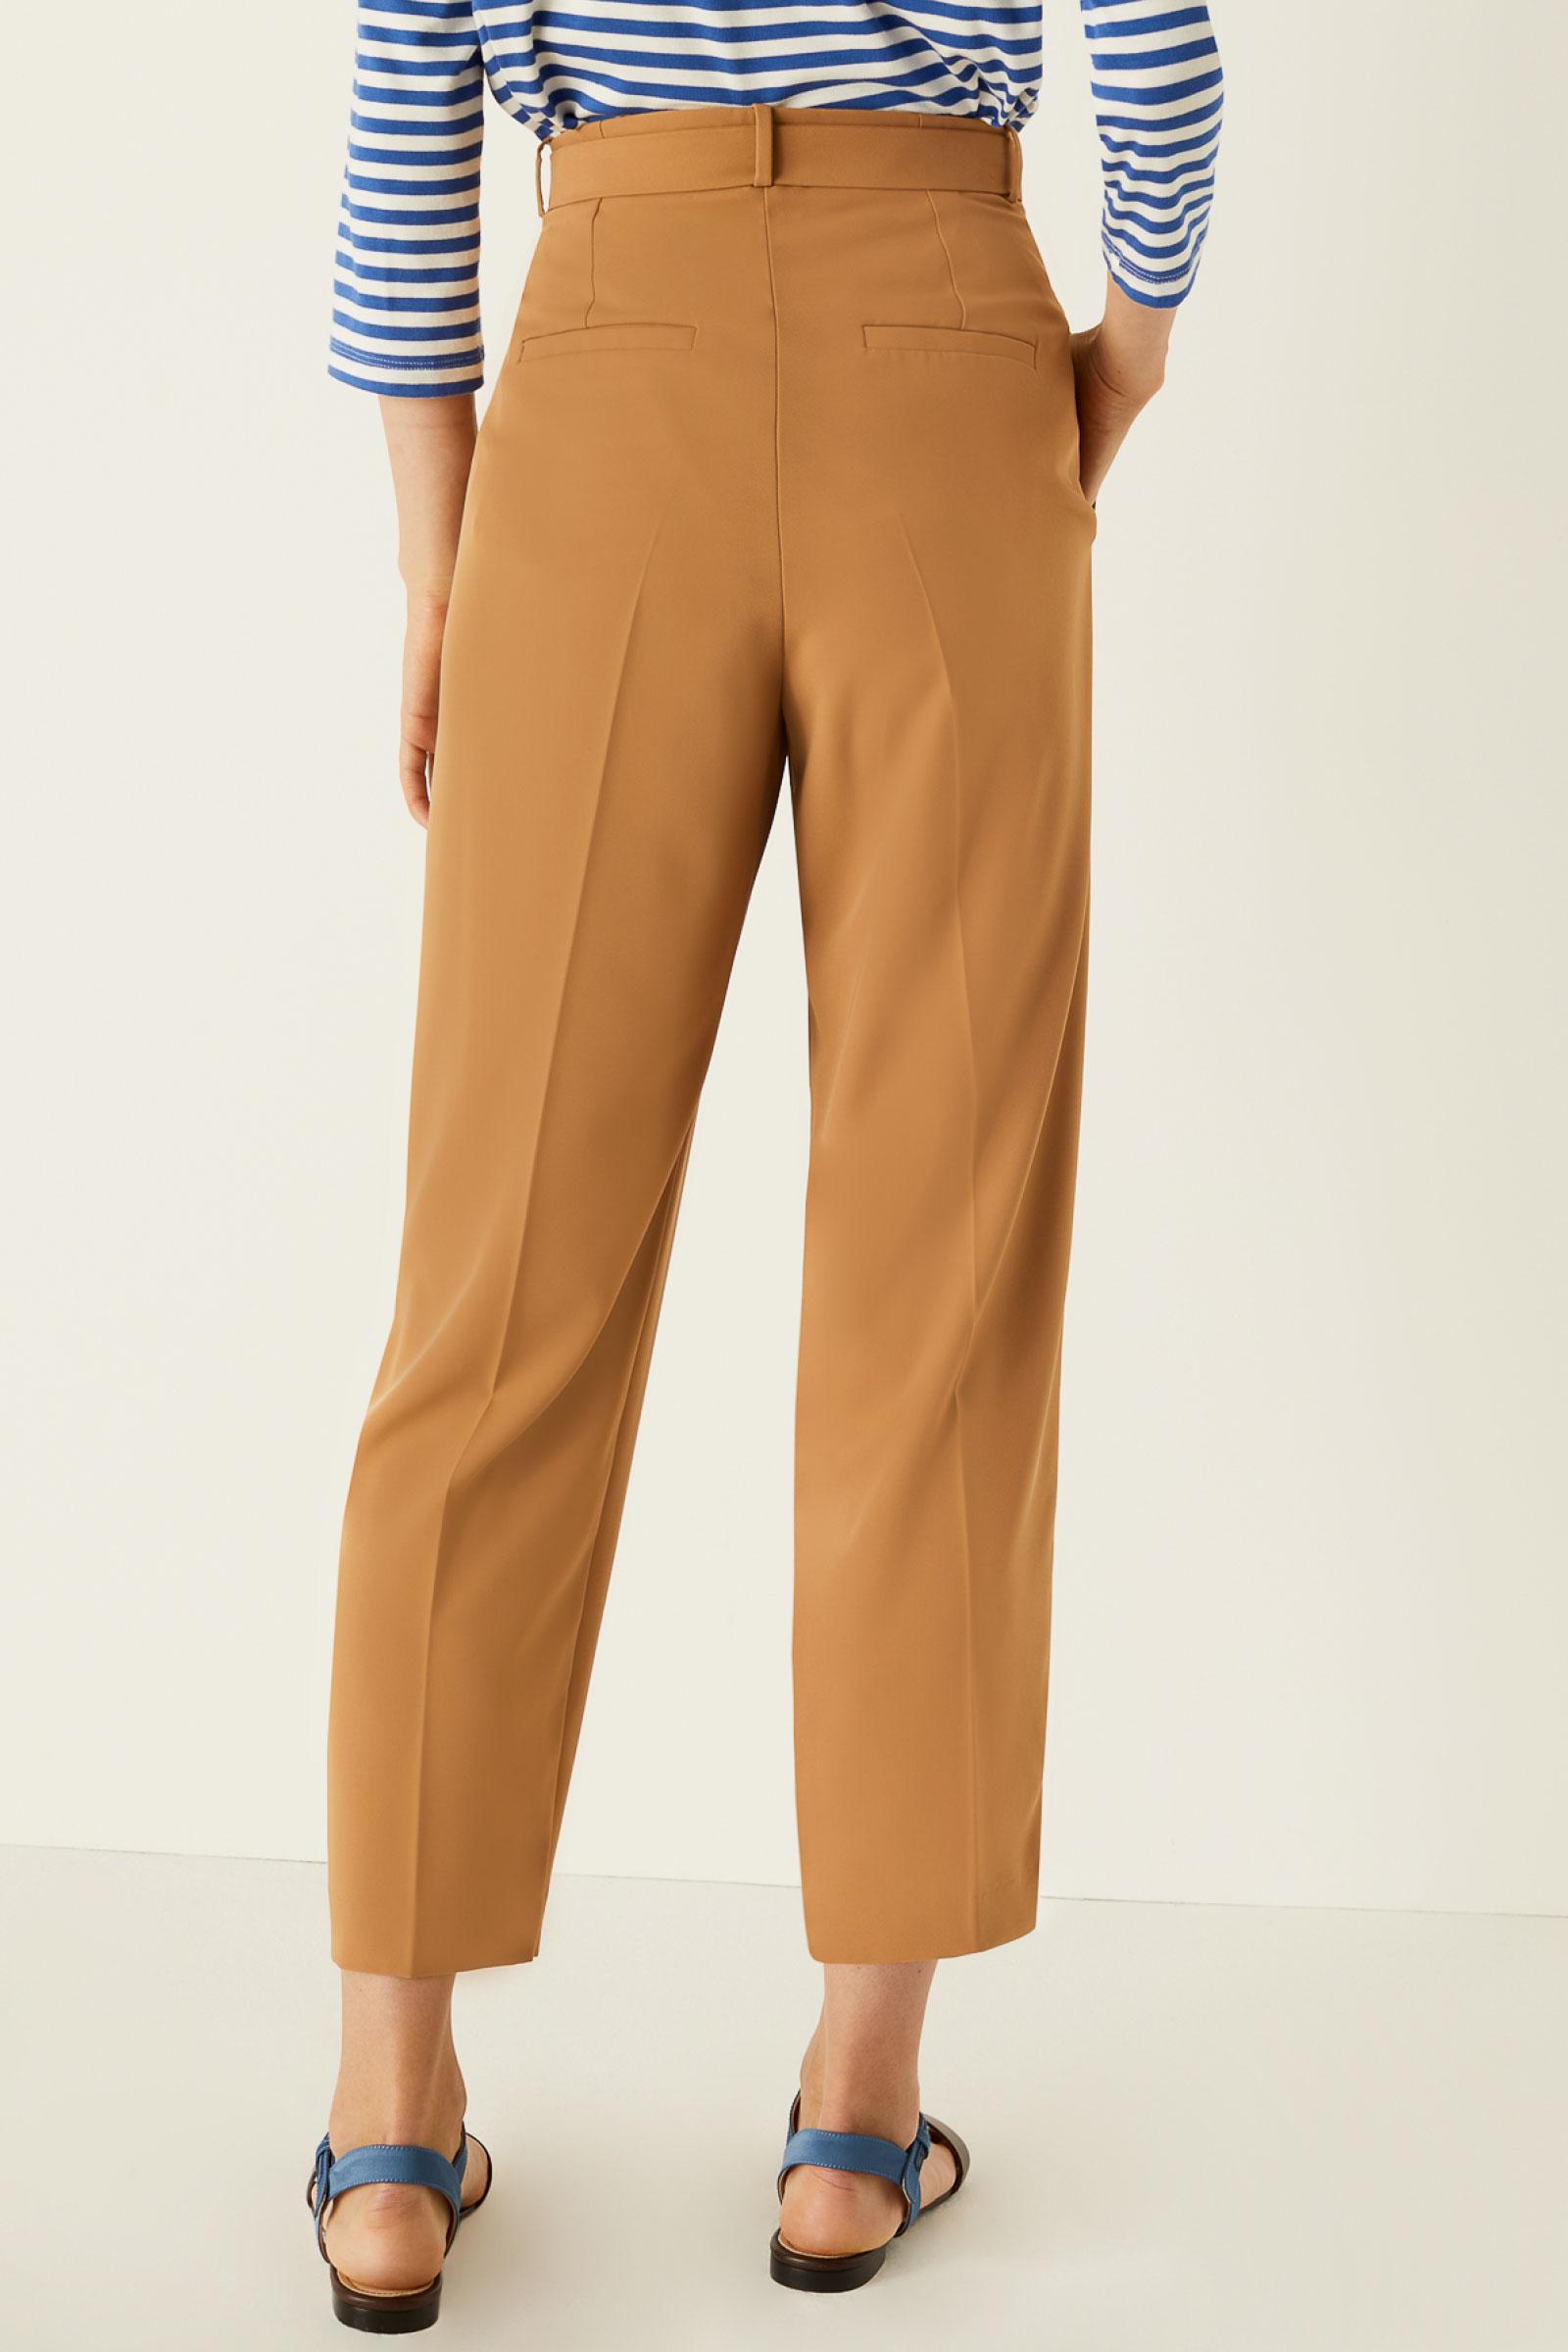 EMME MARELLA Pantalone Modello CLOWN EMME MARELLA | Pantalone | 51311115000004